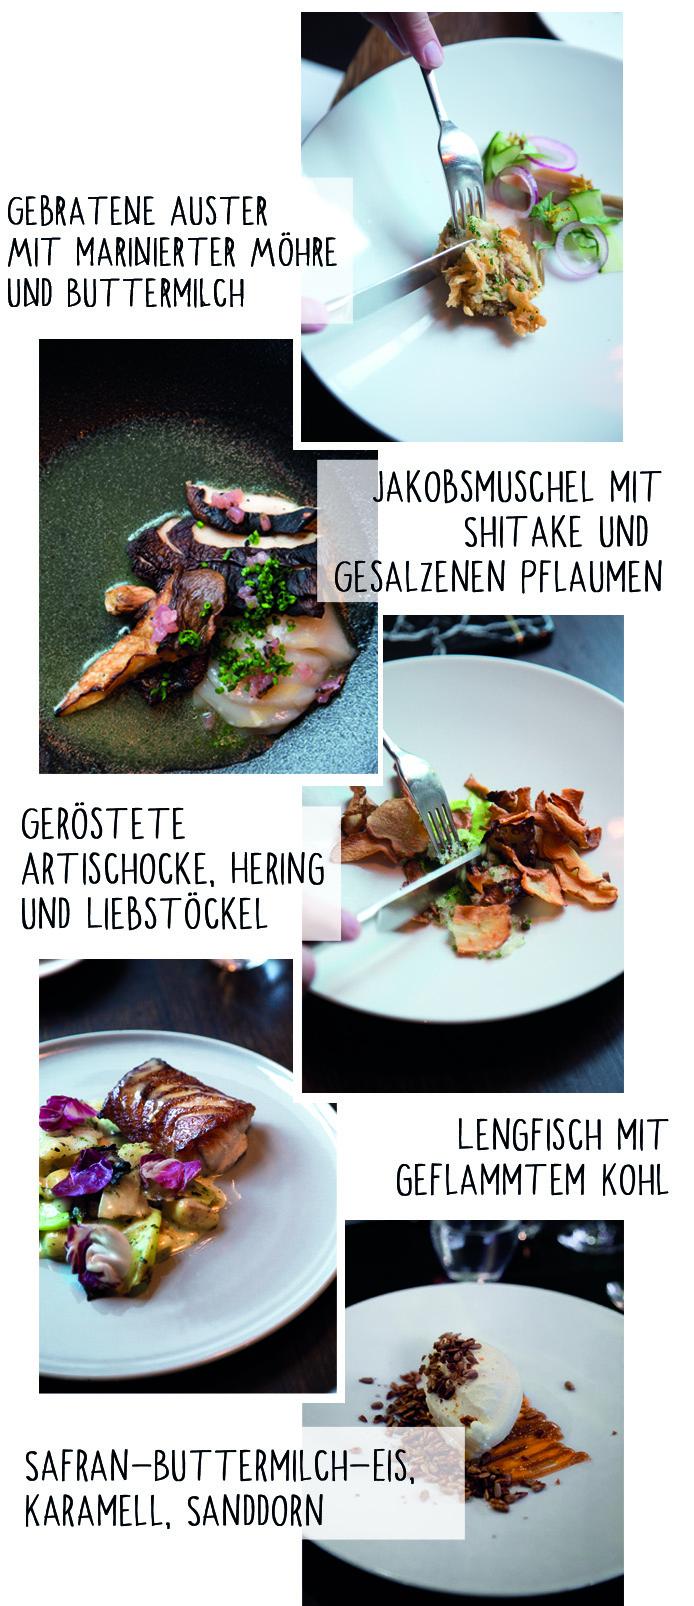 Menü im Restaurant Lysverket